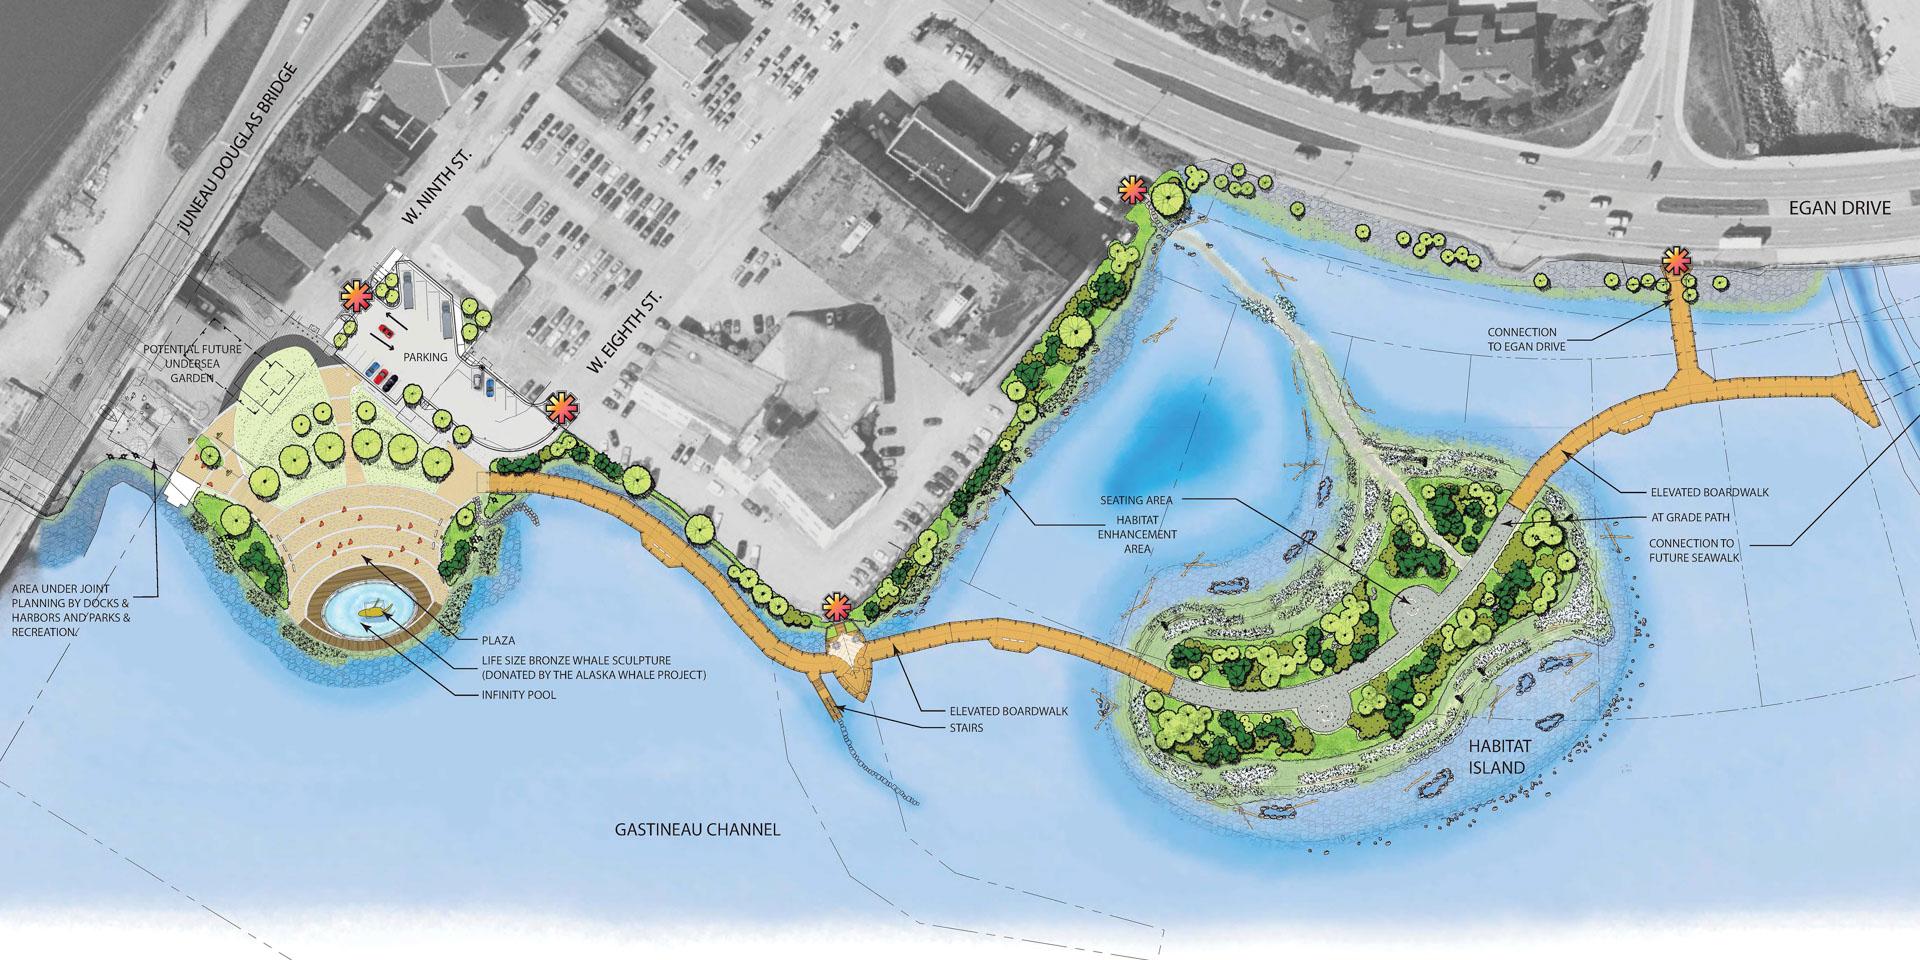 Plan of Seawalk pedestrian route